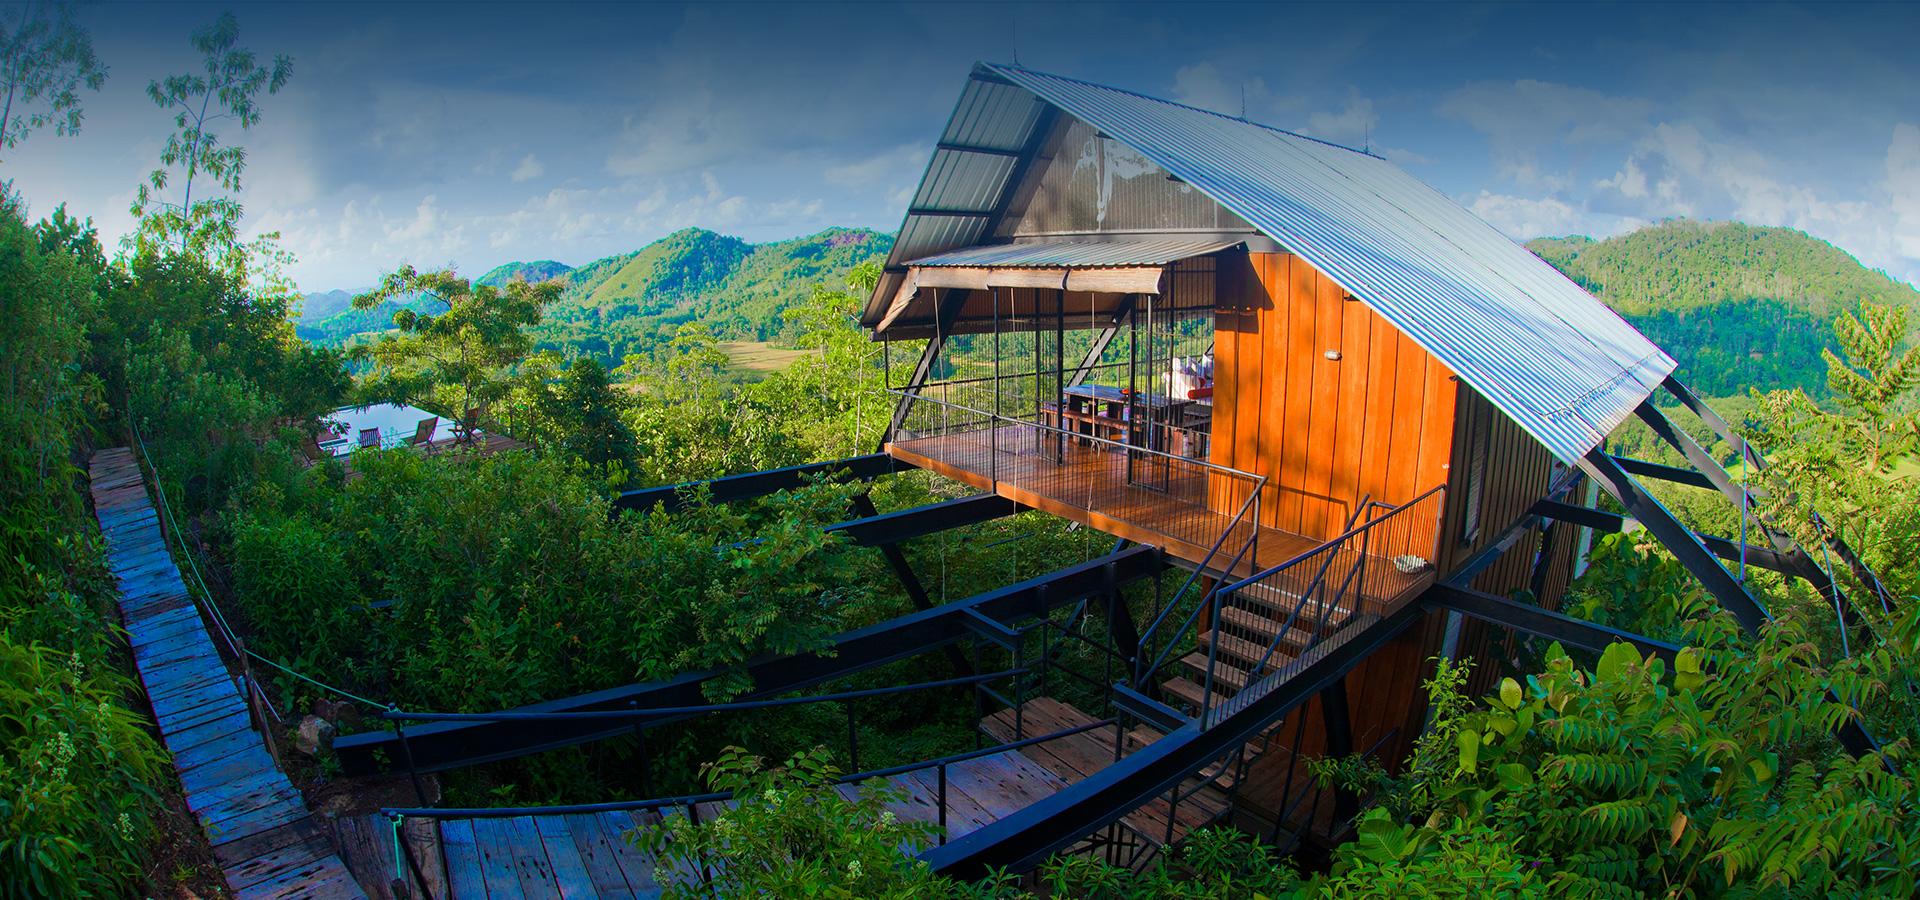 The Ark Tree House